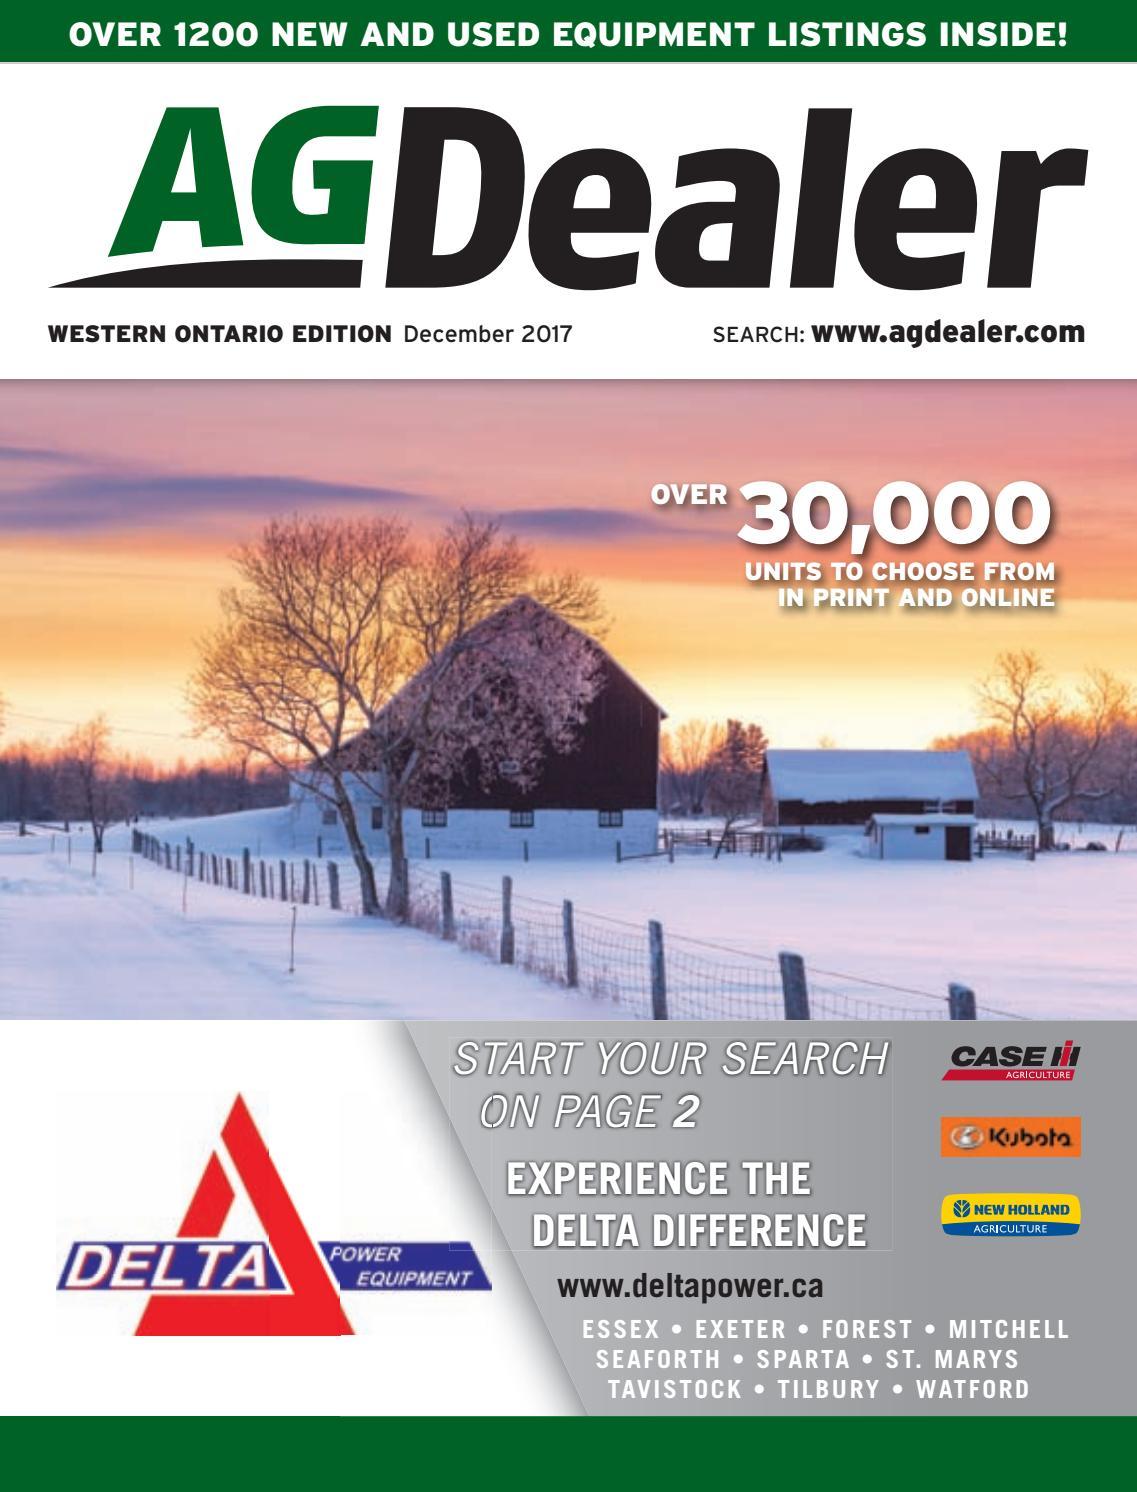 AGDealer Western Ontario Edition, November 27, 2017 by Farm